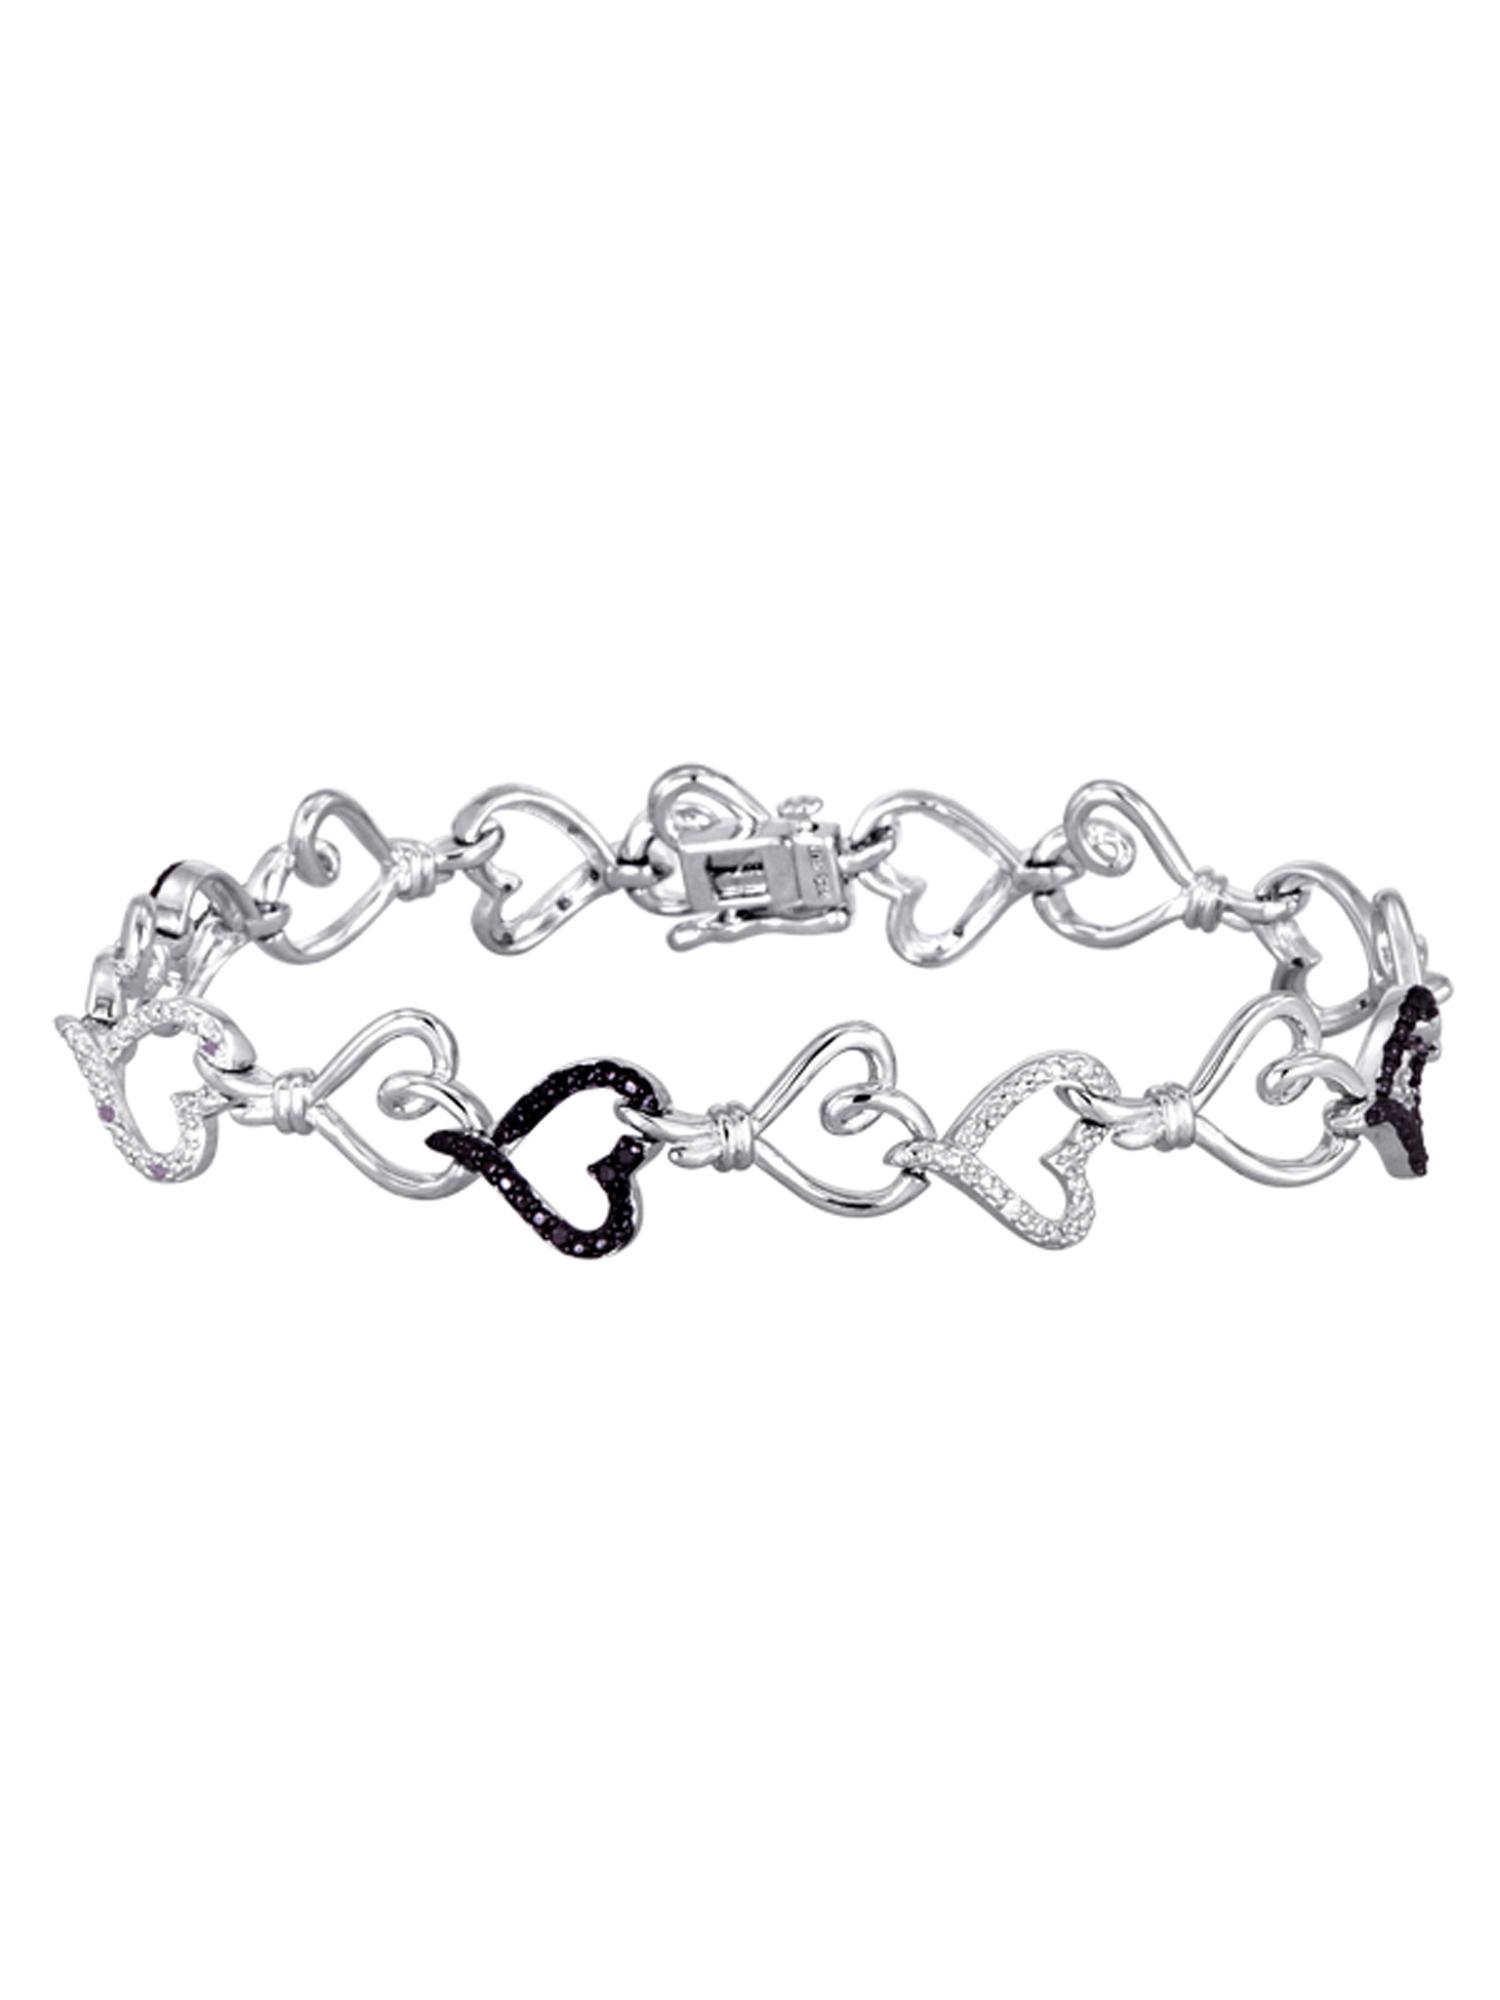 "Knots of Love Sterling Silver 1/10 Carat T.W. Black and White Diamond Heart Bracelet, 7.5"""